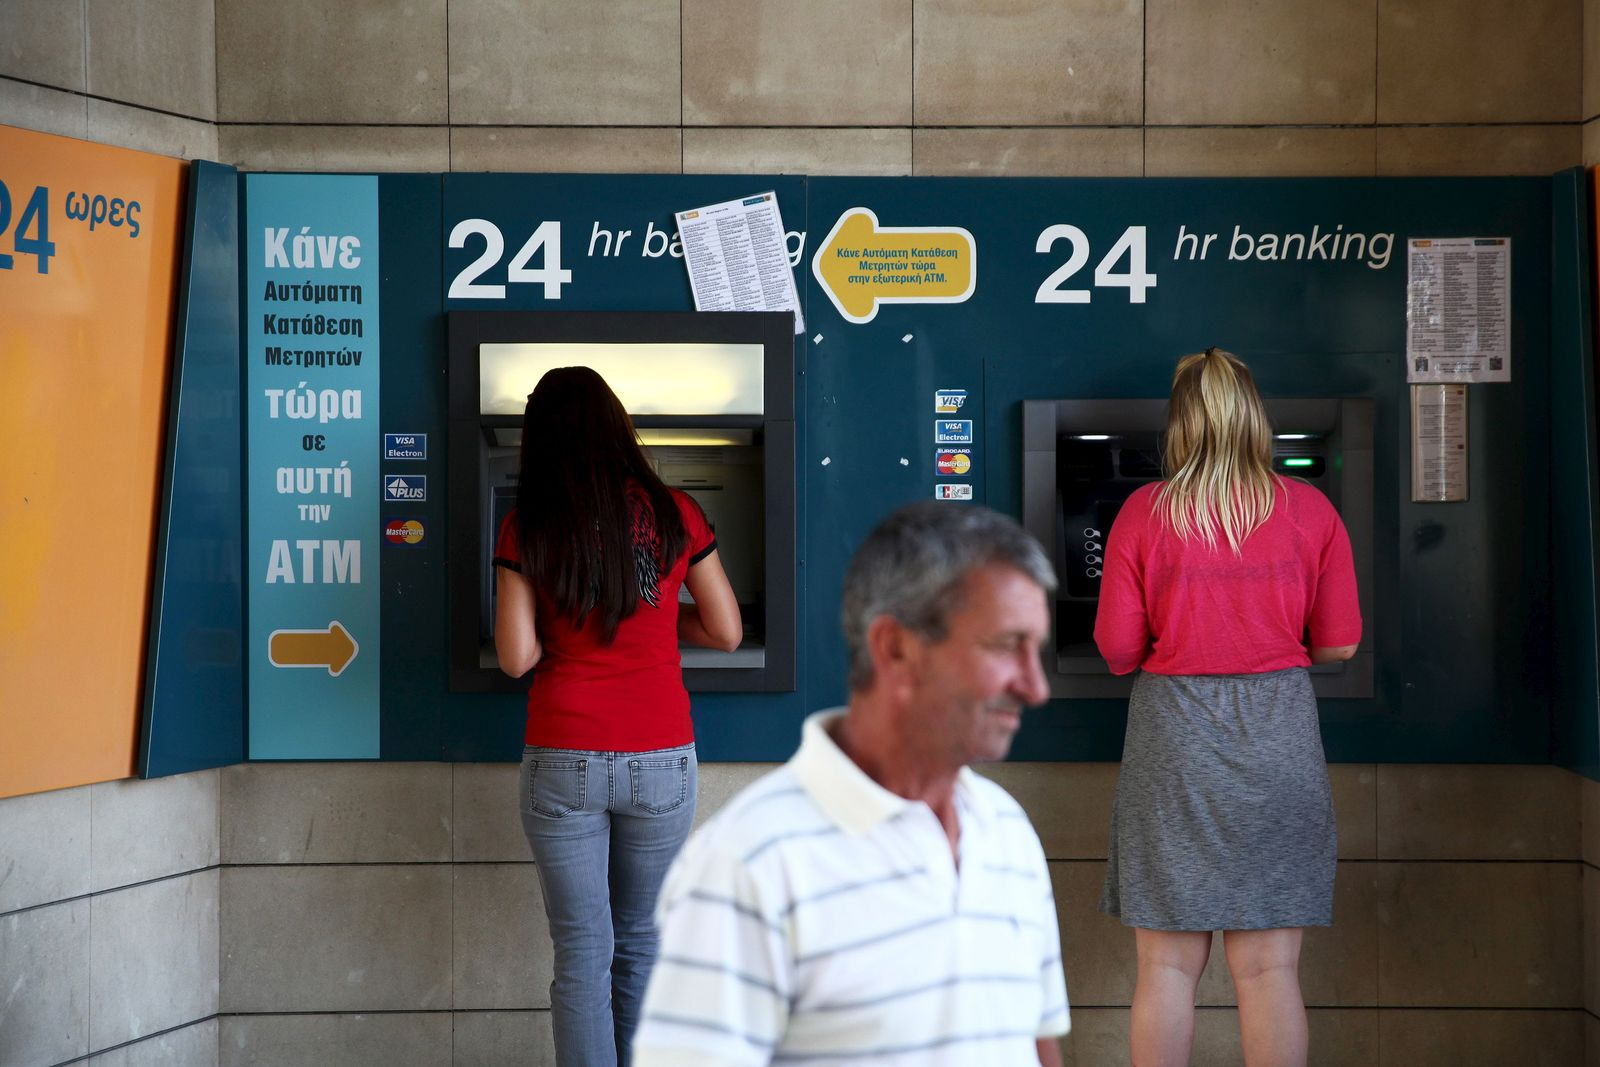 Zypern / Konjunktur / Banken / Finanzkrise